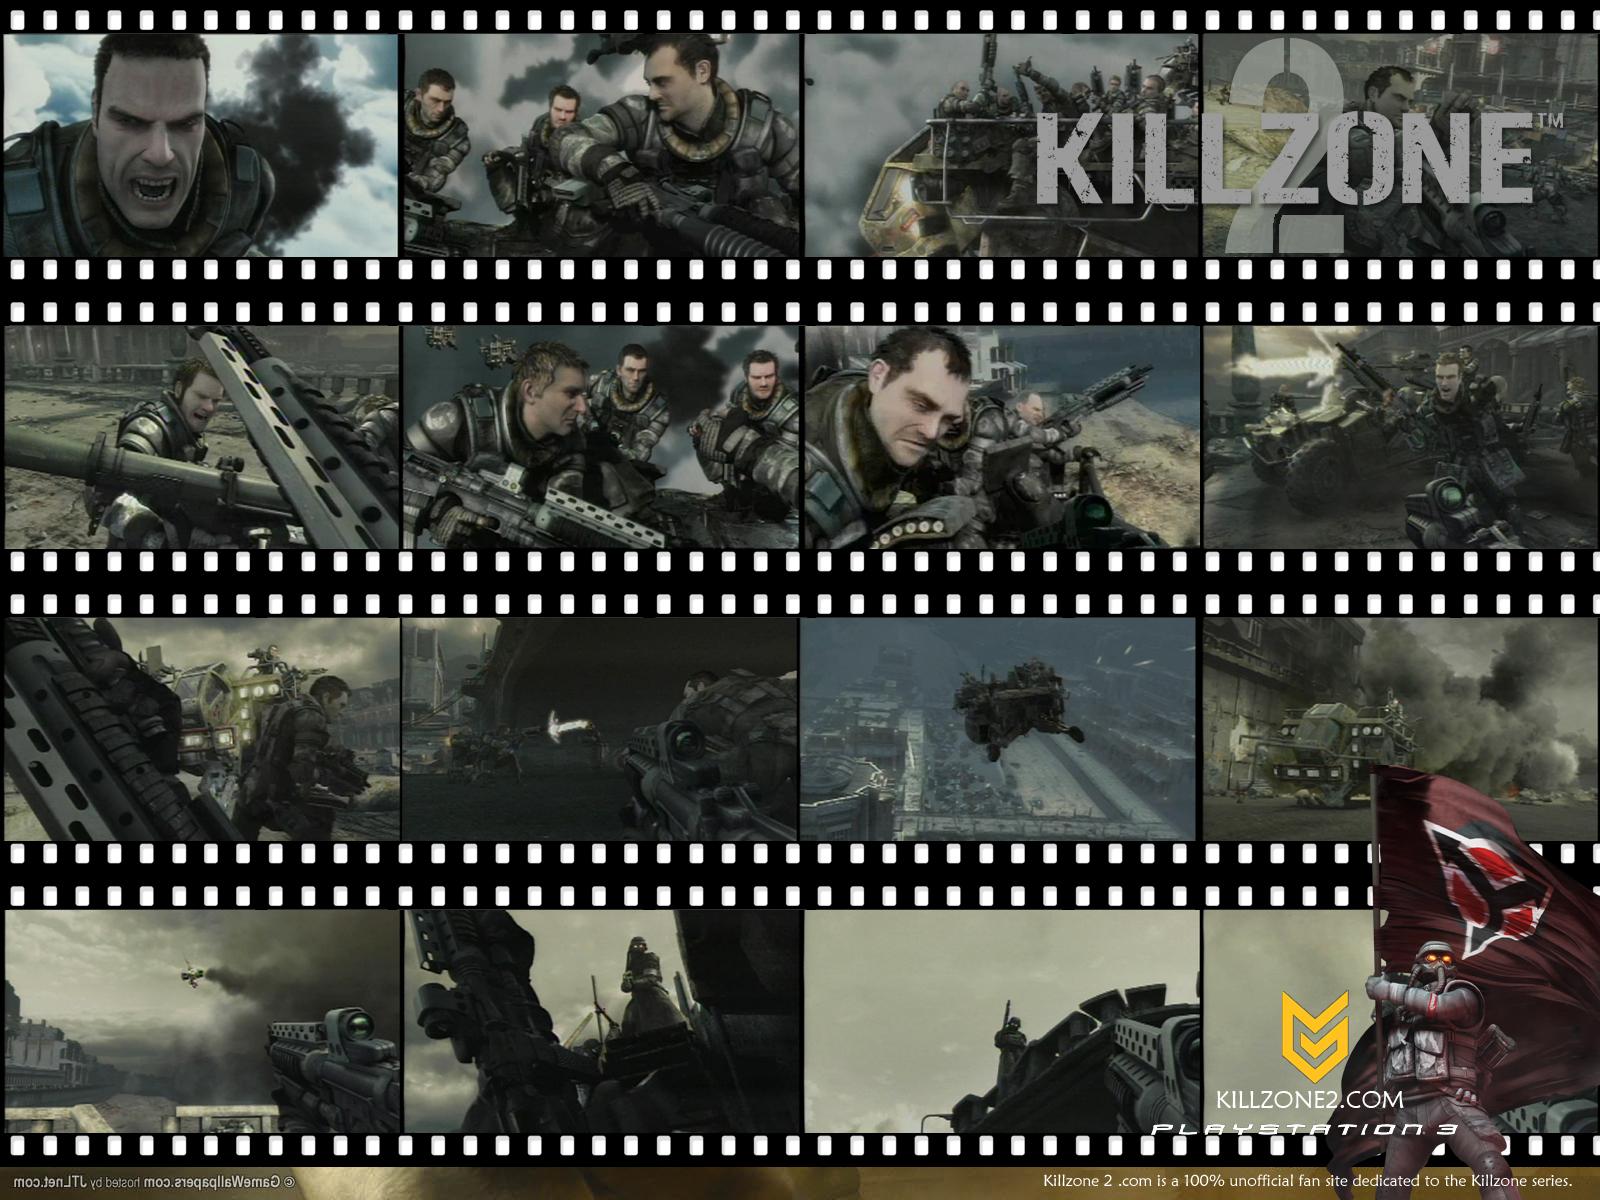 Killzone-2-working-title-2-N8FYBWQBL1-1600x1200